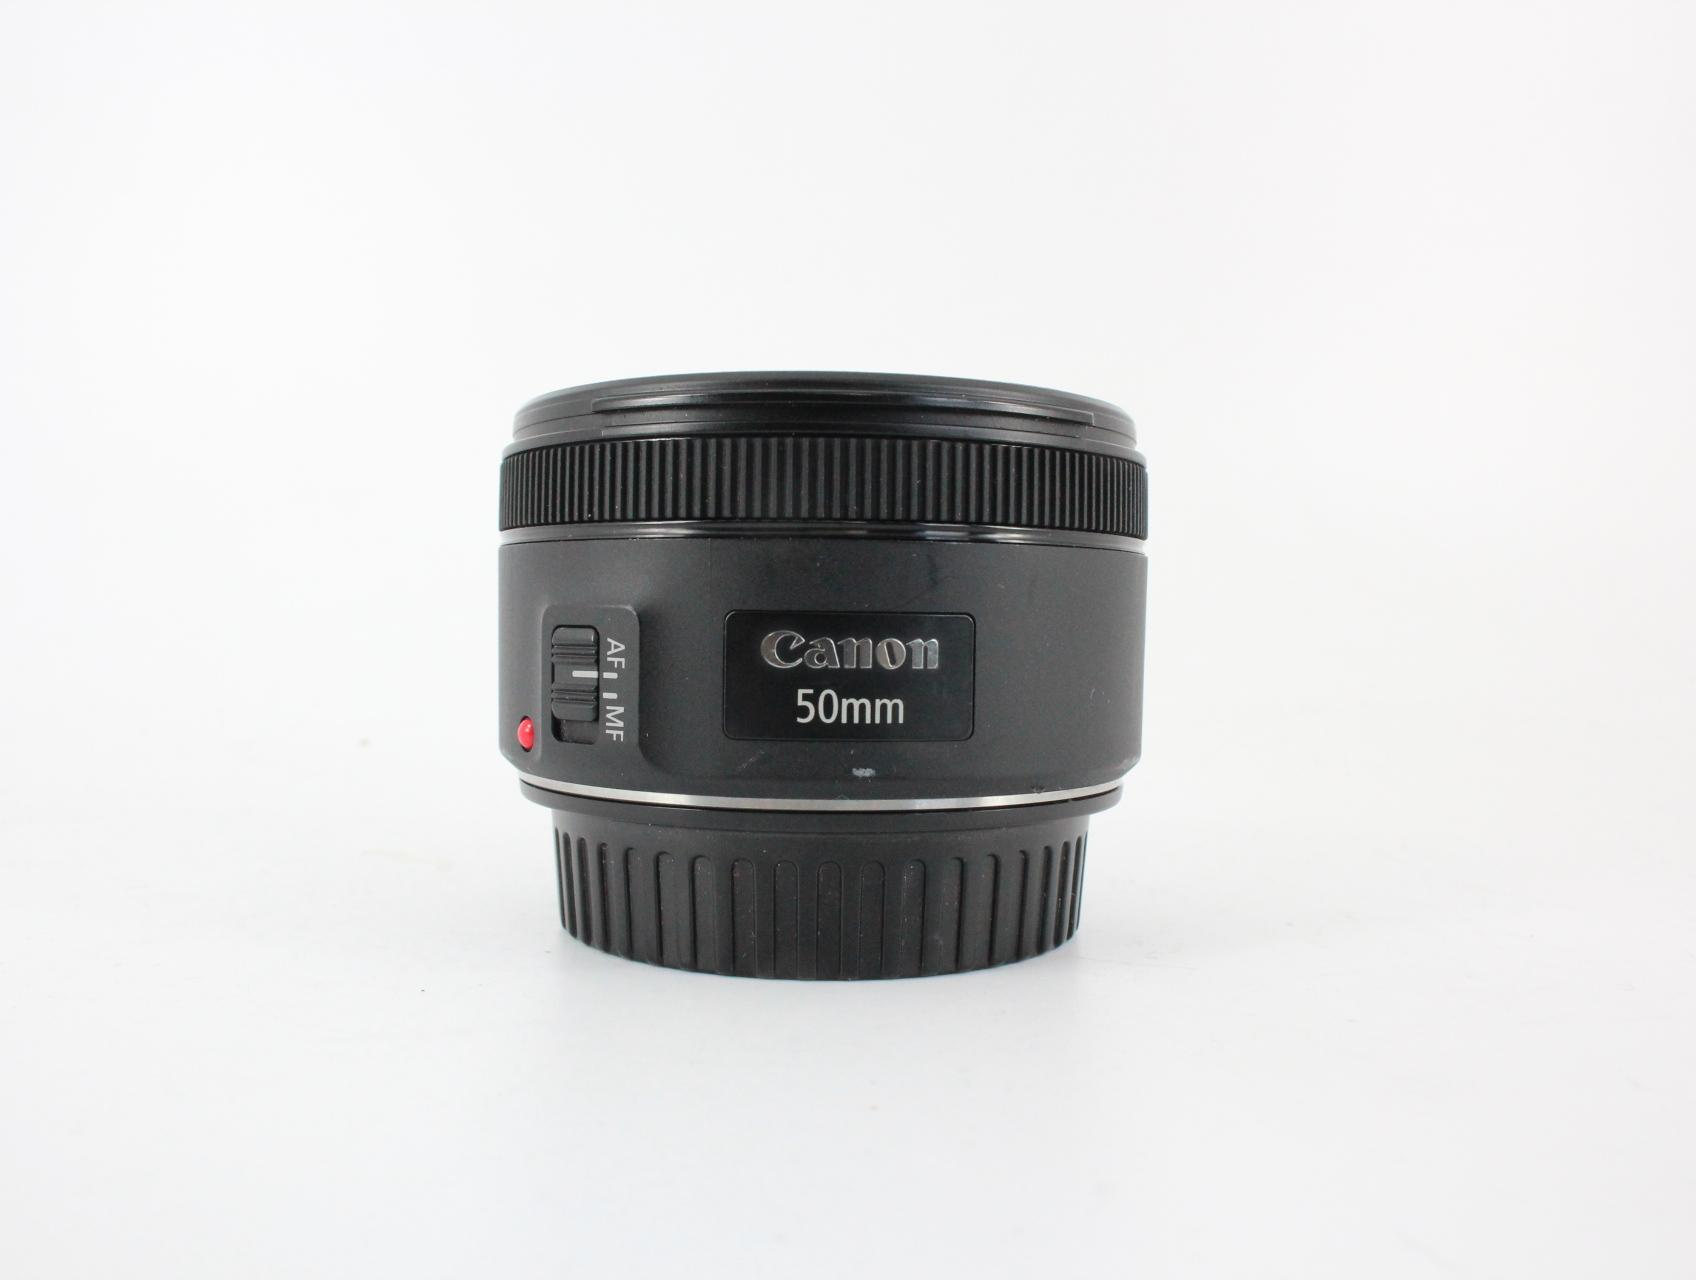 canon 50mm image